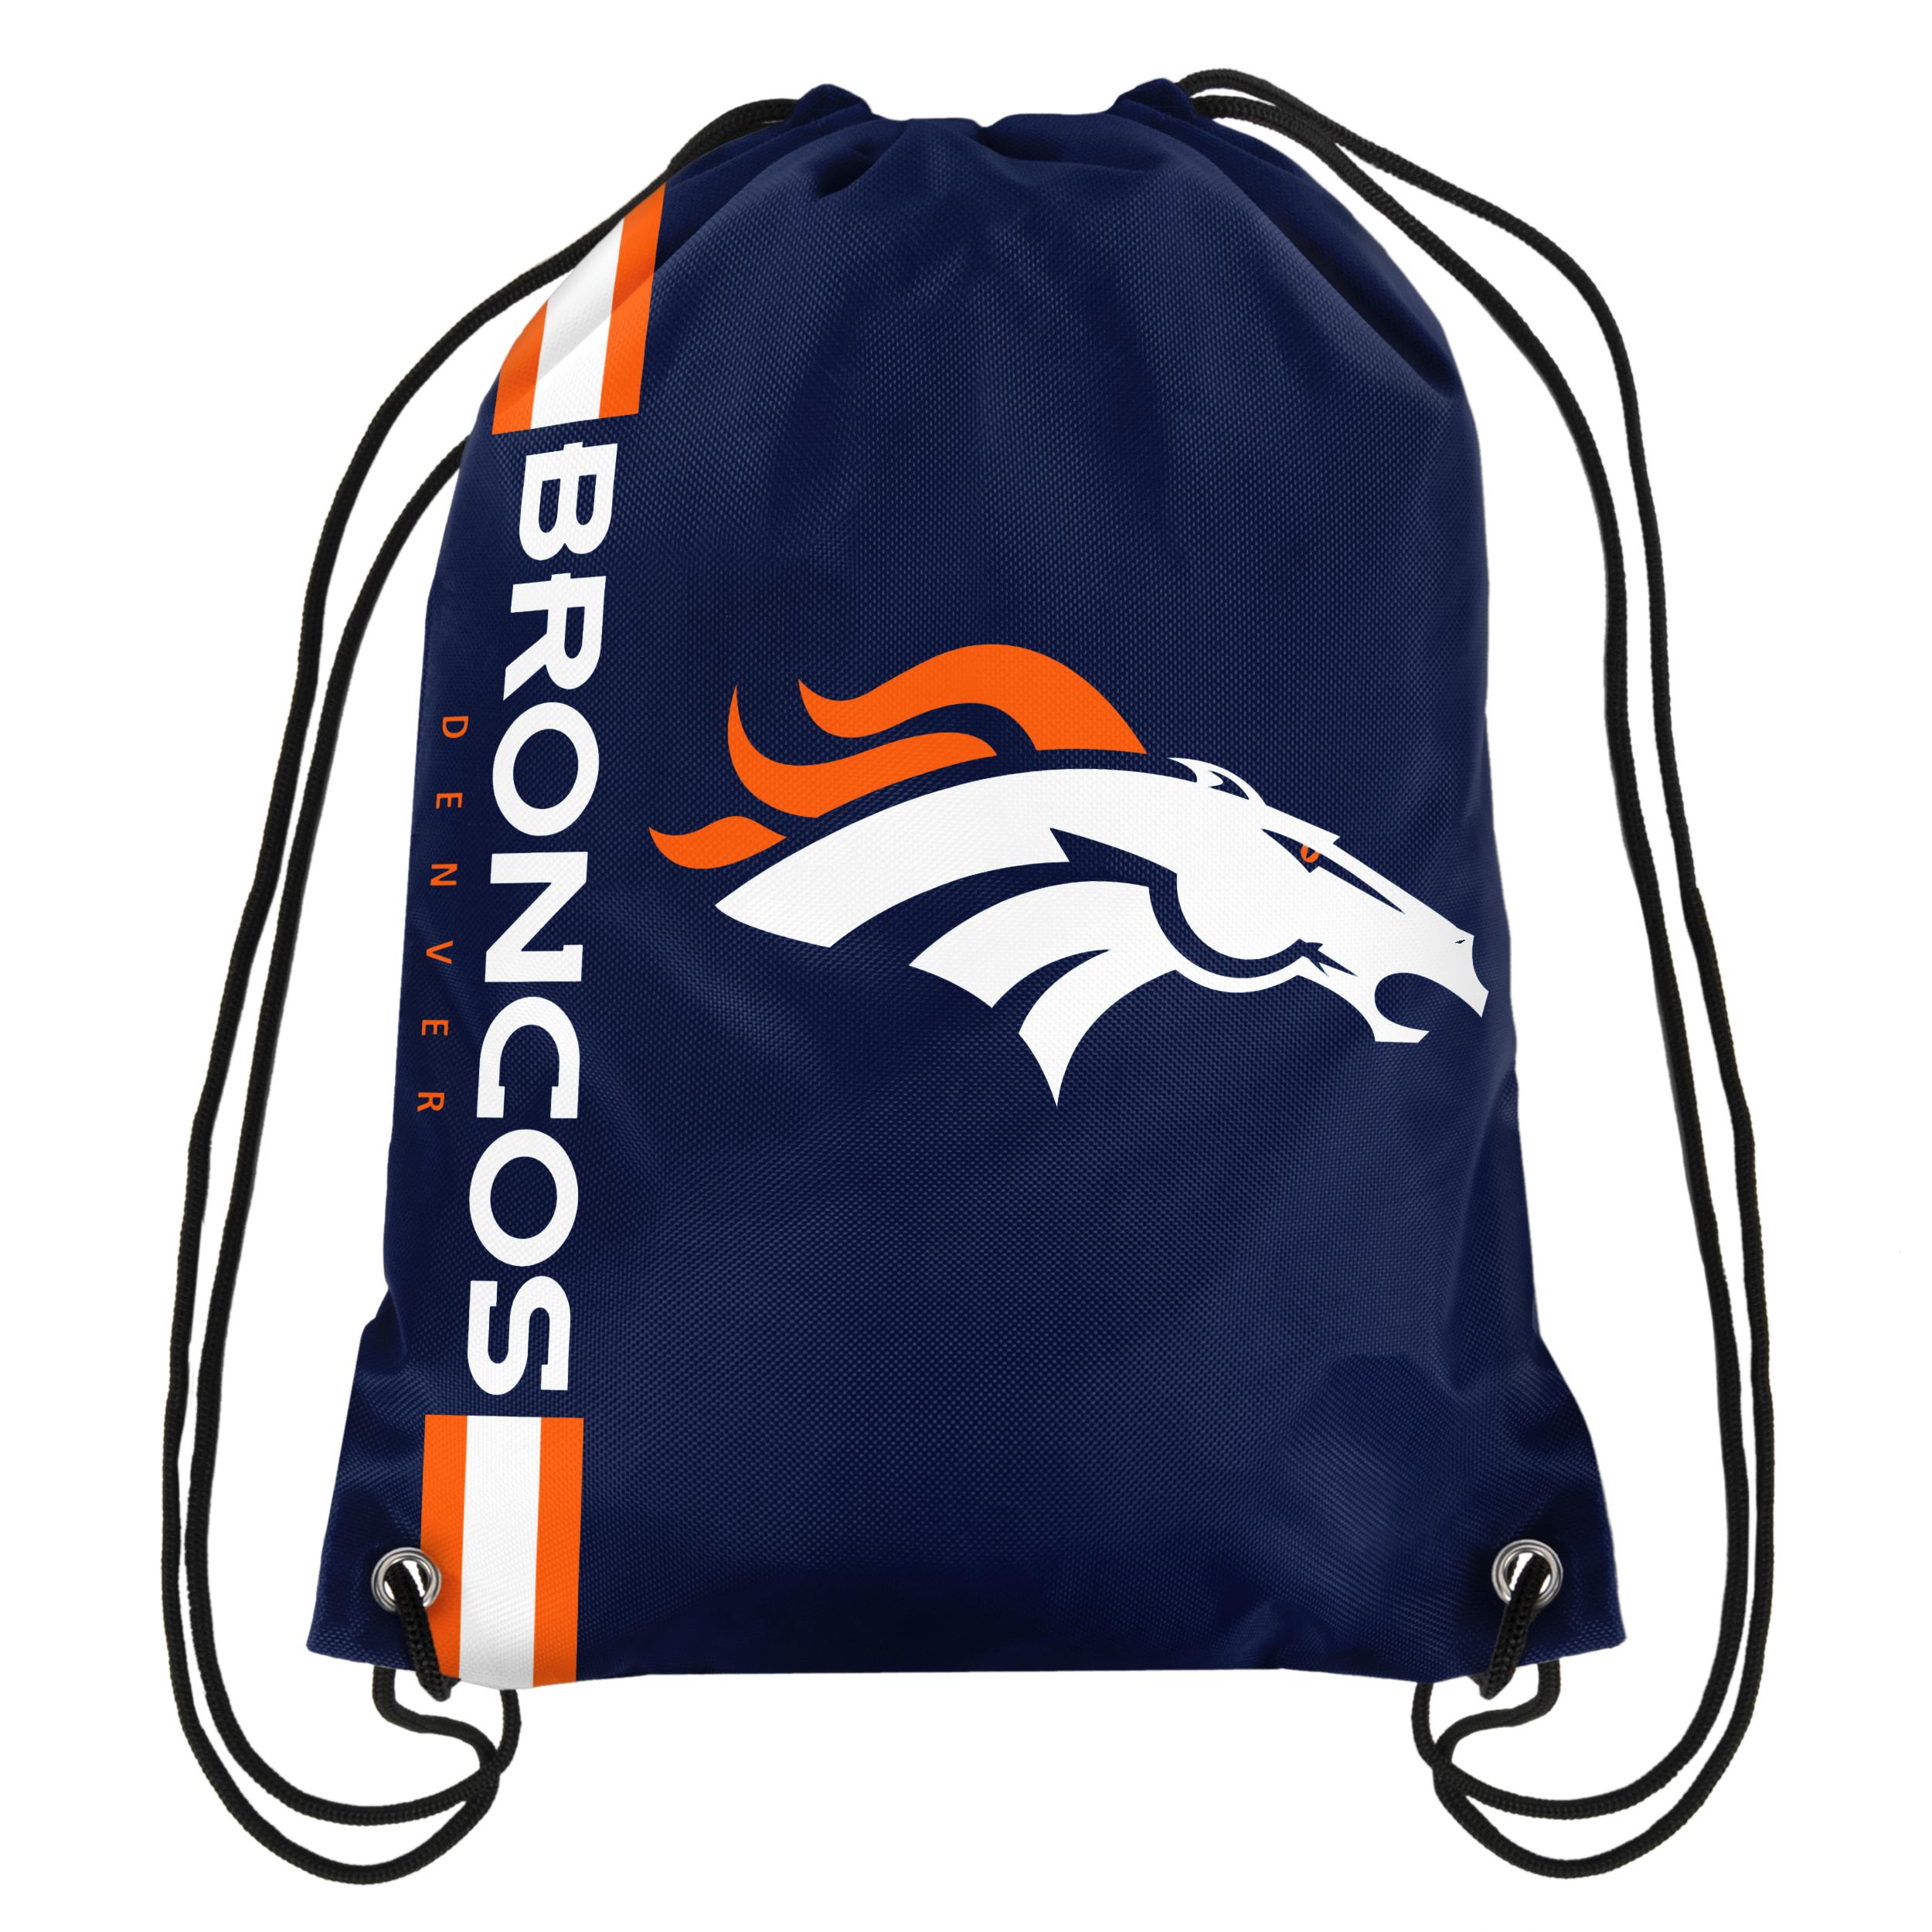 NFL Denver Broncos Drawstring Bag